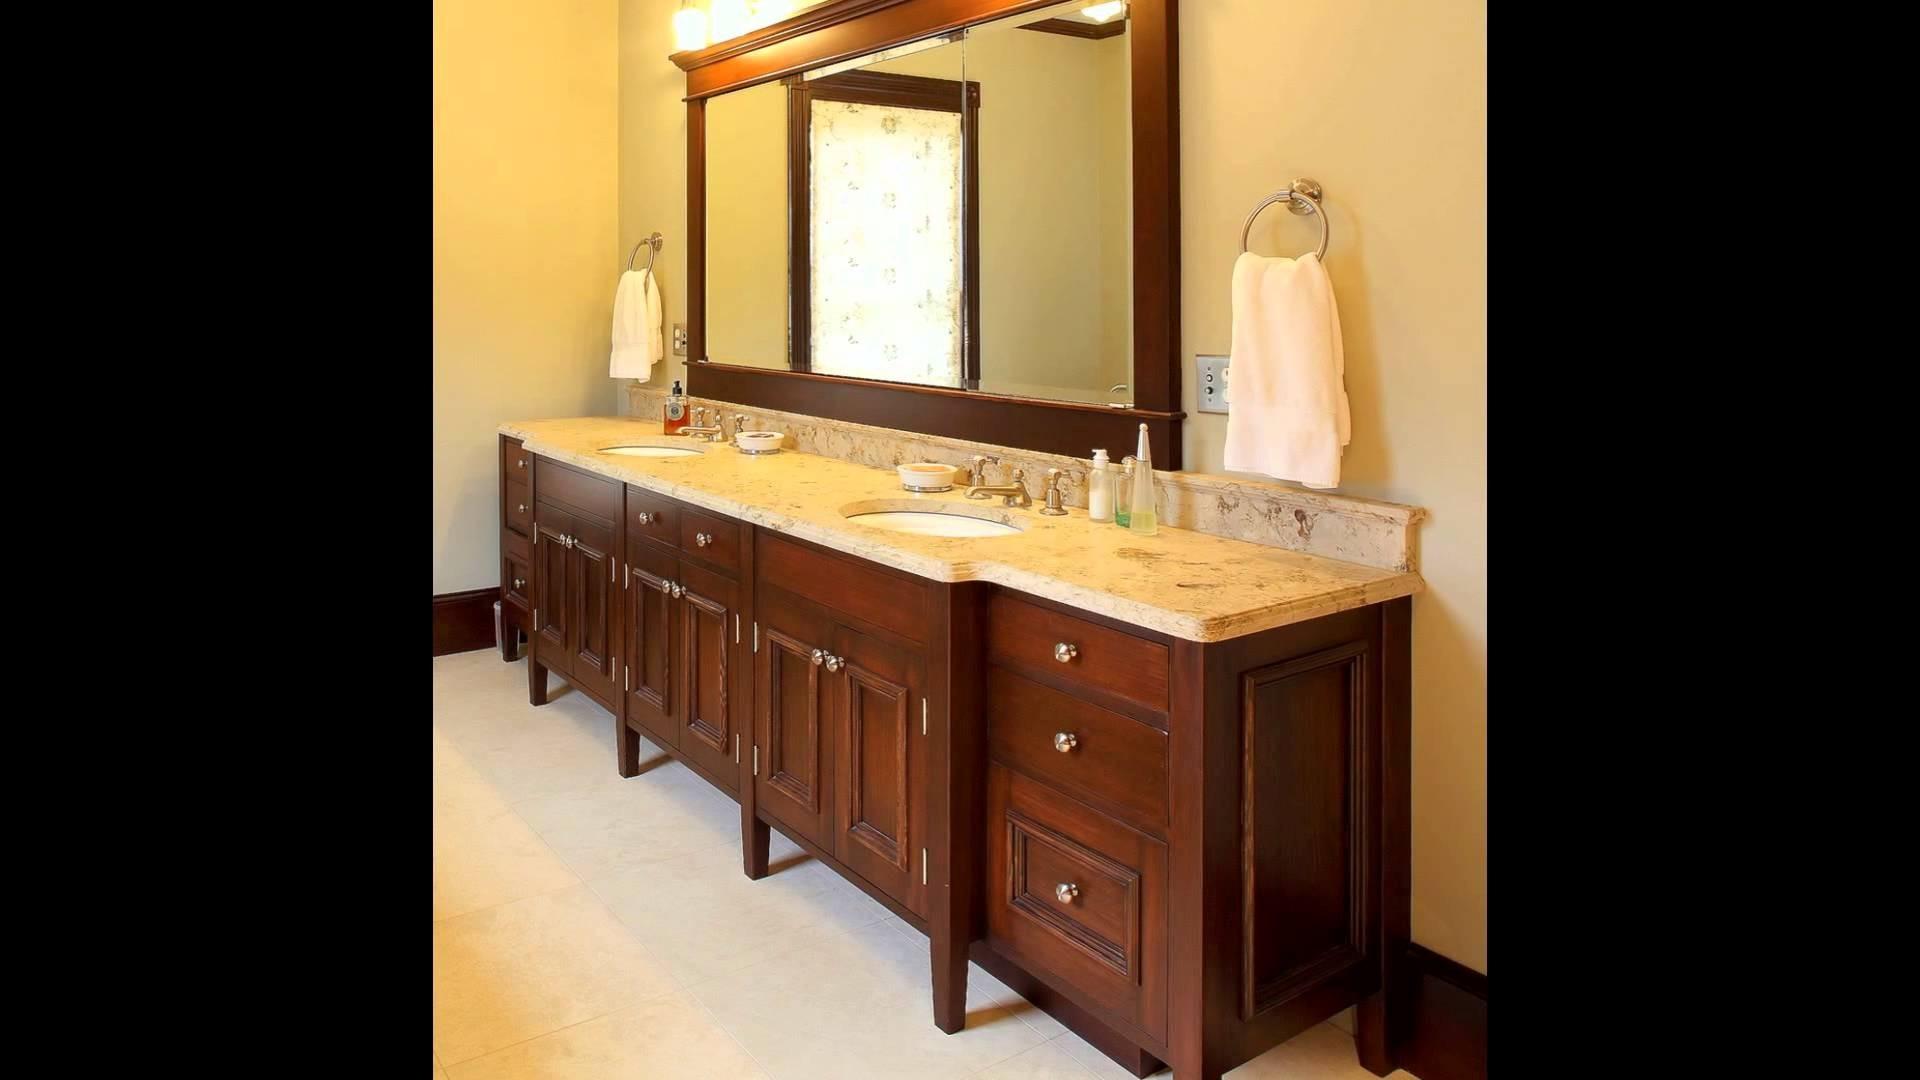 Double Sink Bathroom Countertop Lovely Double Sink Bathroom Vanity Decoration